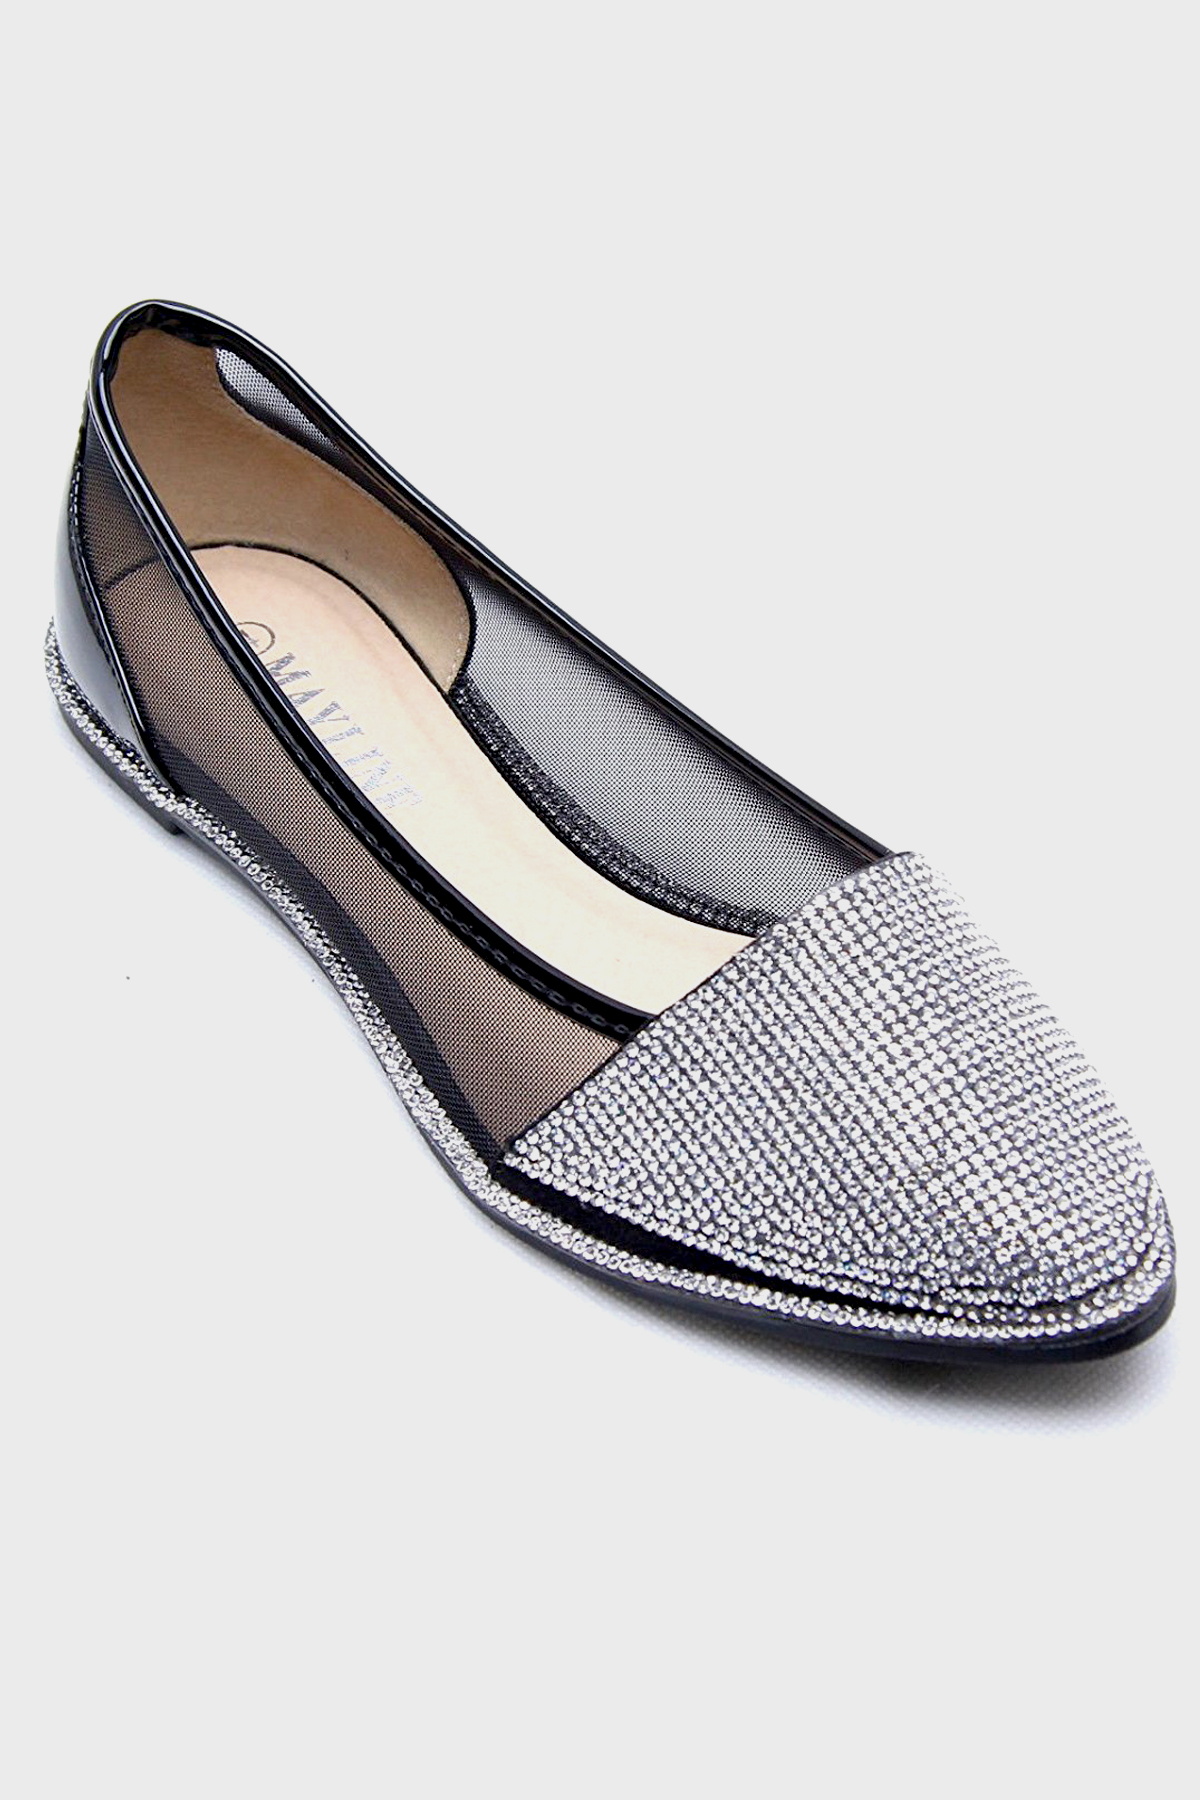 3187f173ab57f1 Mia Black Diamante Shoes - Shelikes